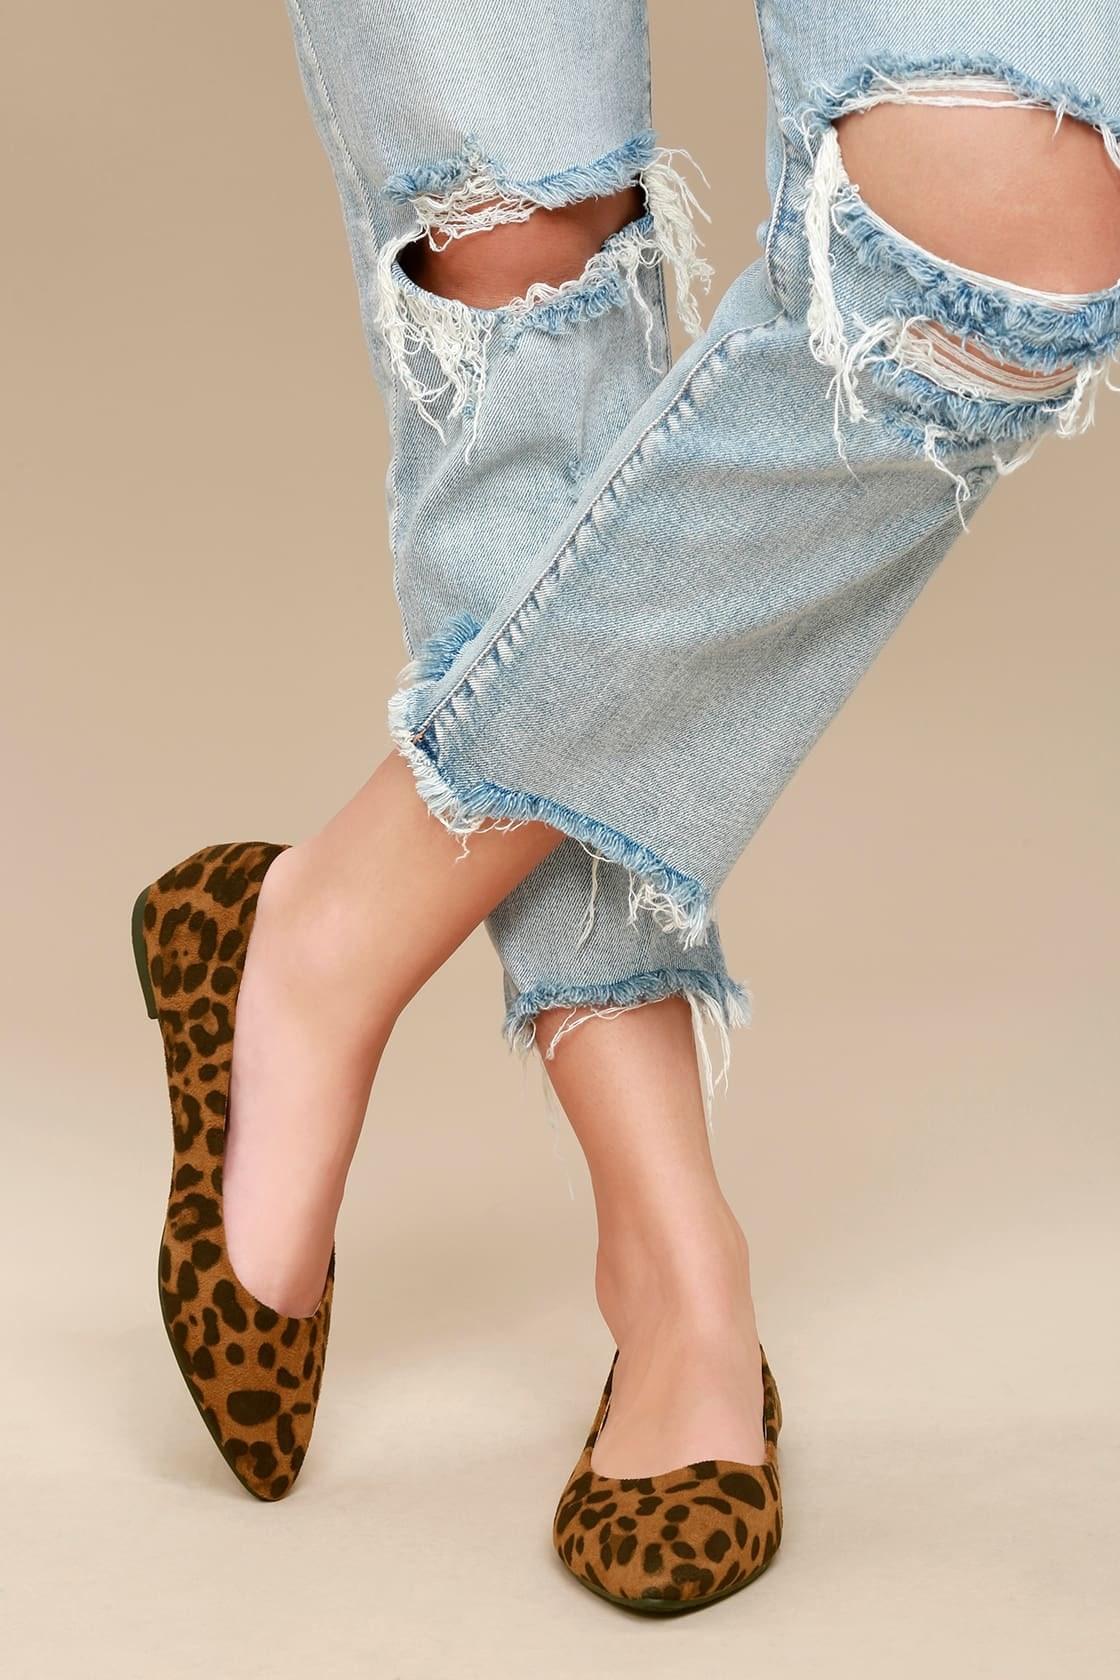 model wearing the leopard print flats